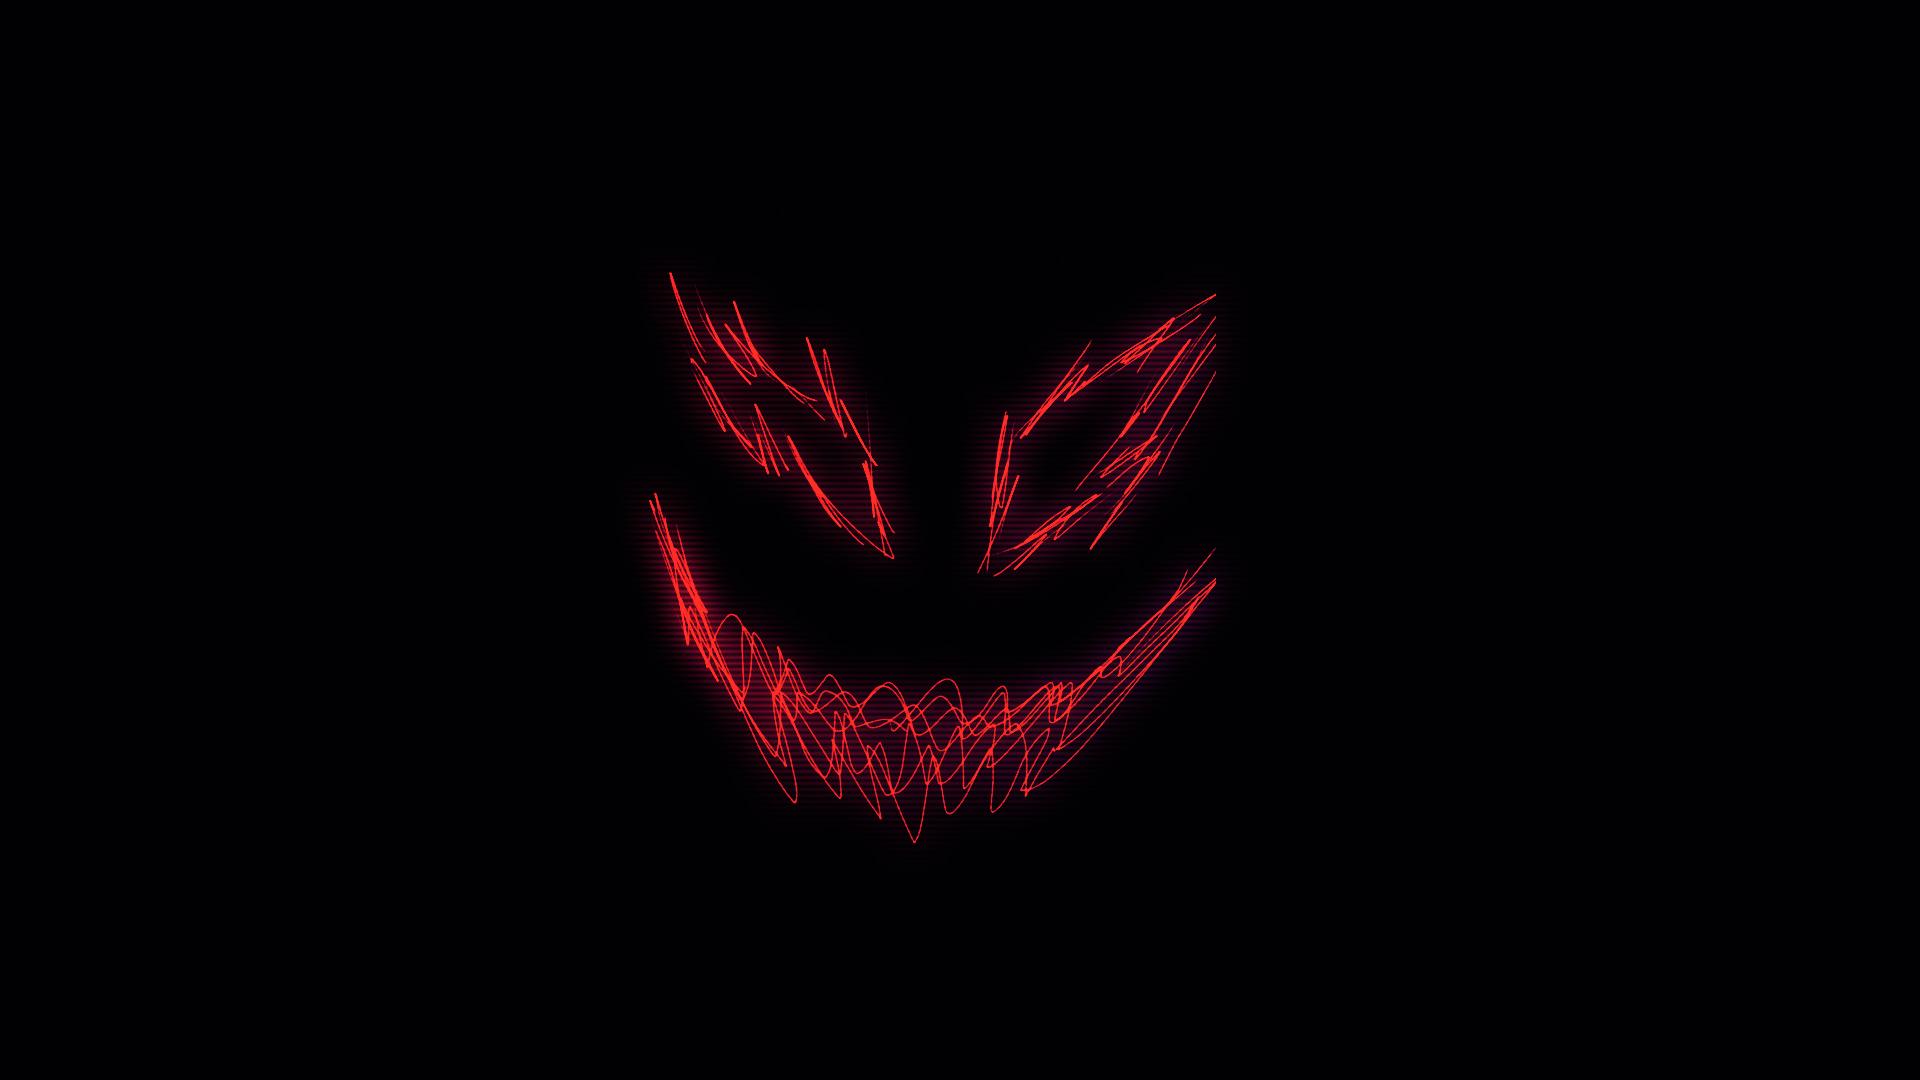 General 1920x1080 demon smiling smile large eyes dark glitch art neon pointy teeth minimalism creature Photoshop waveforms